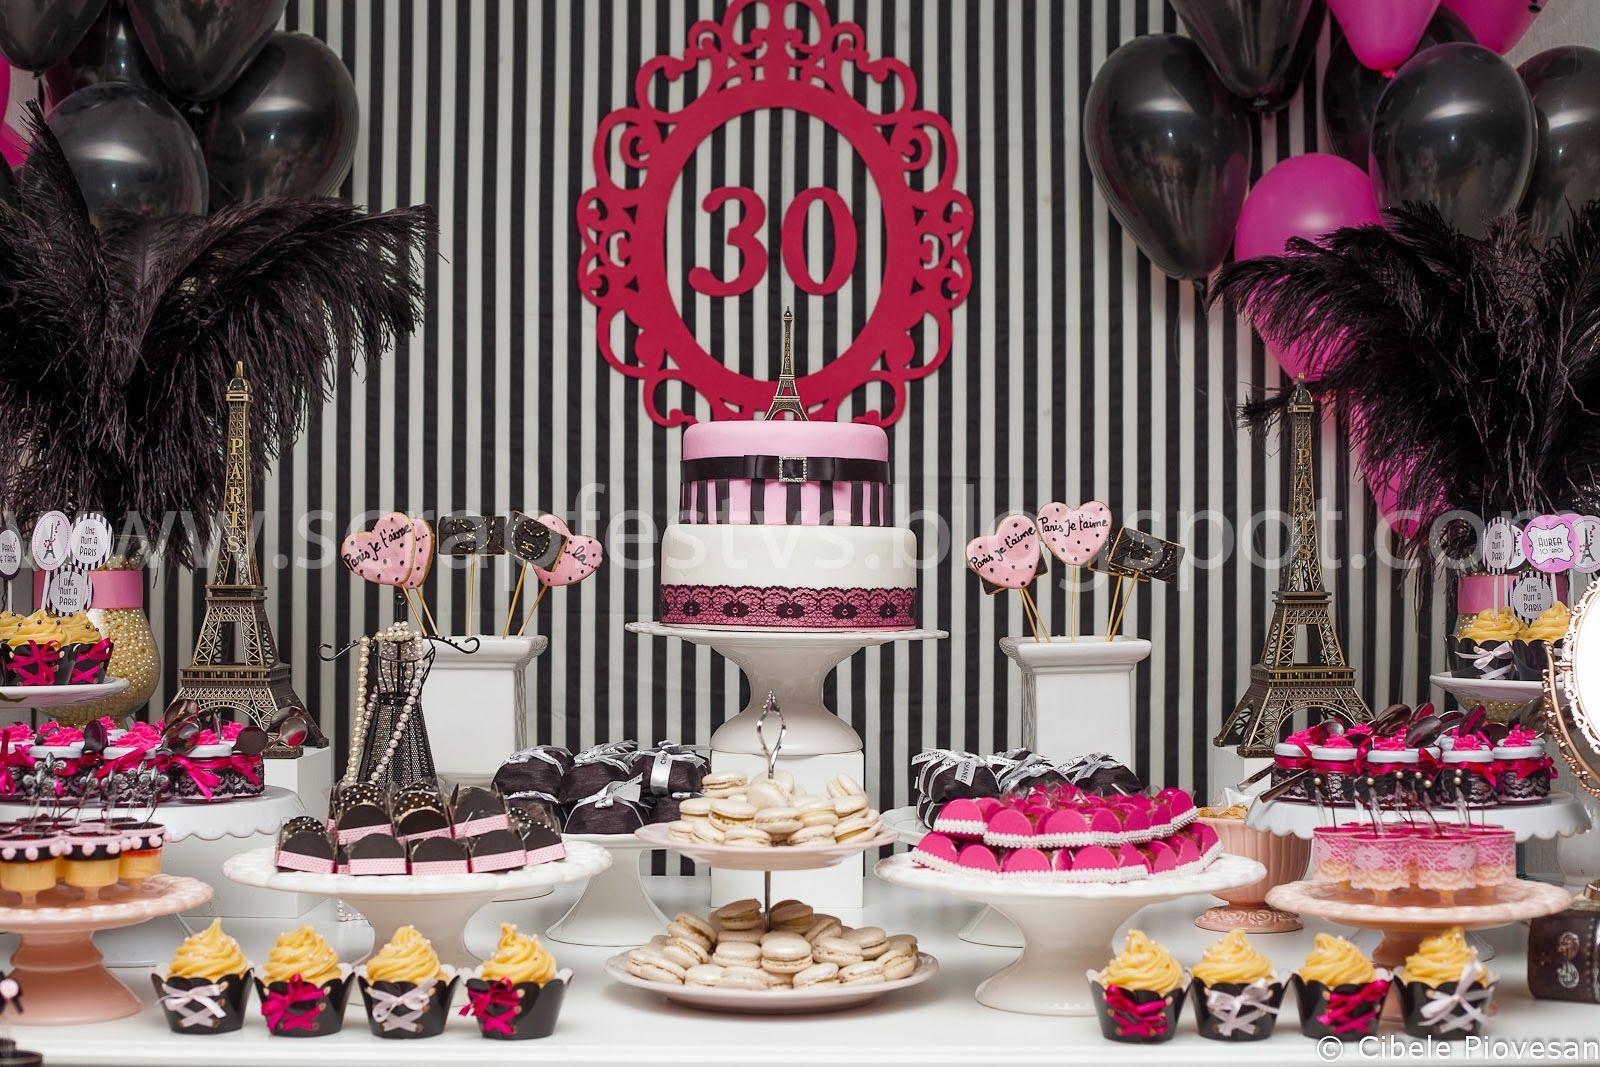 Excepcional tudo sobre paris aniversario - Pesquisa Google | niver | Pinterest  MC99